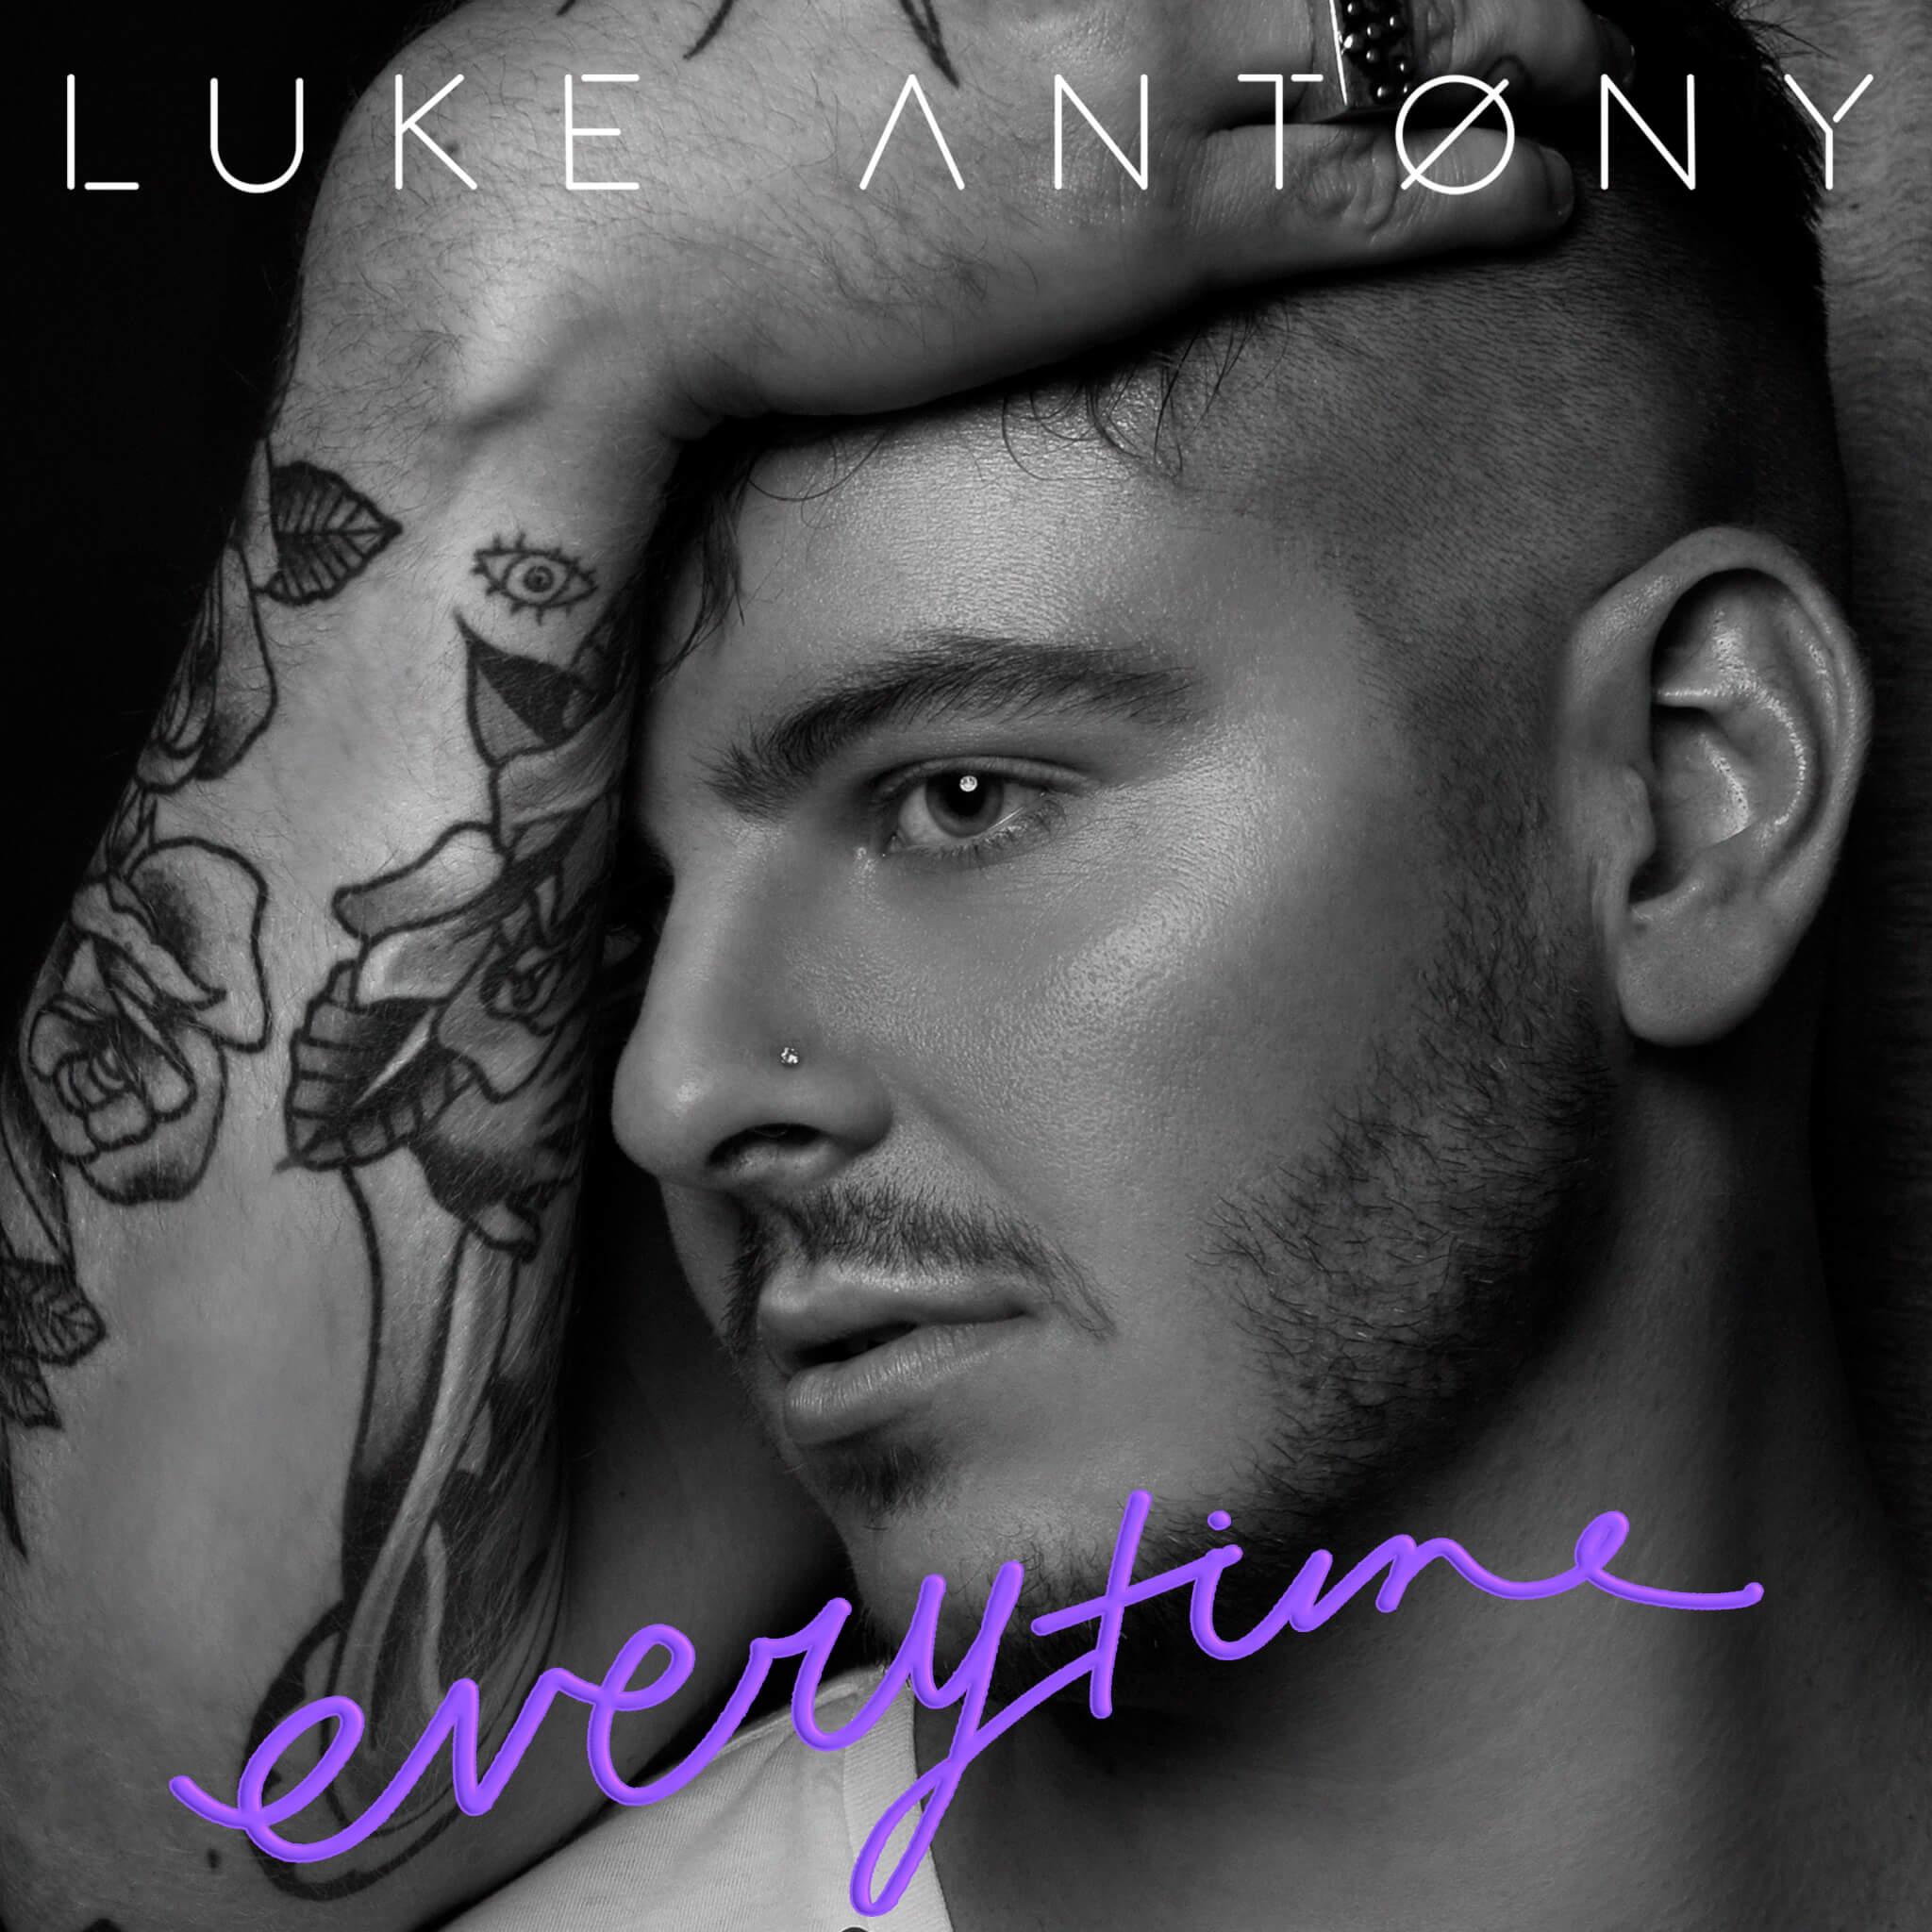 Luke Antony